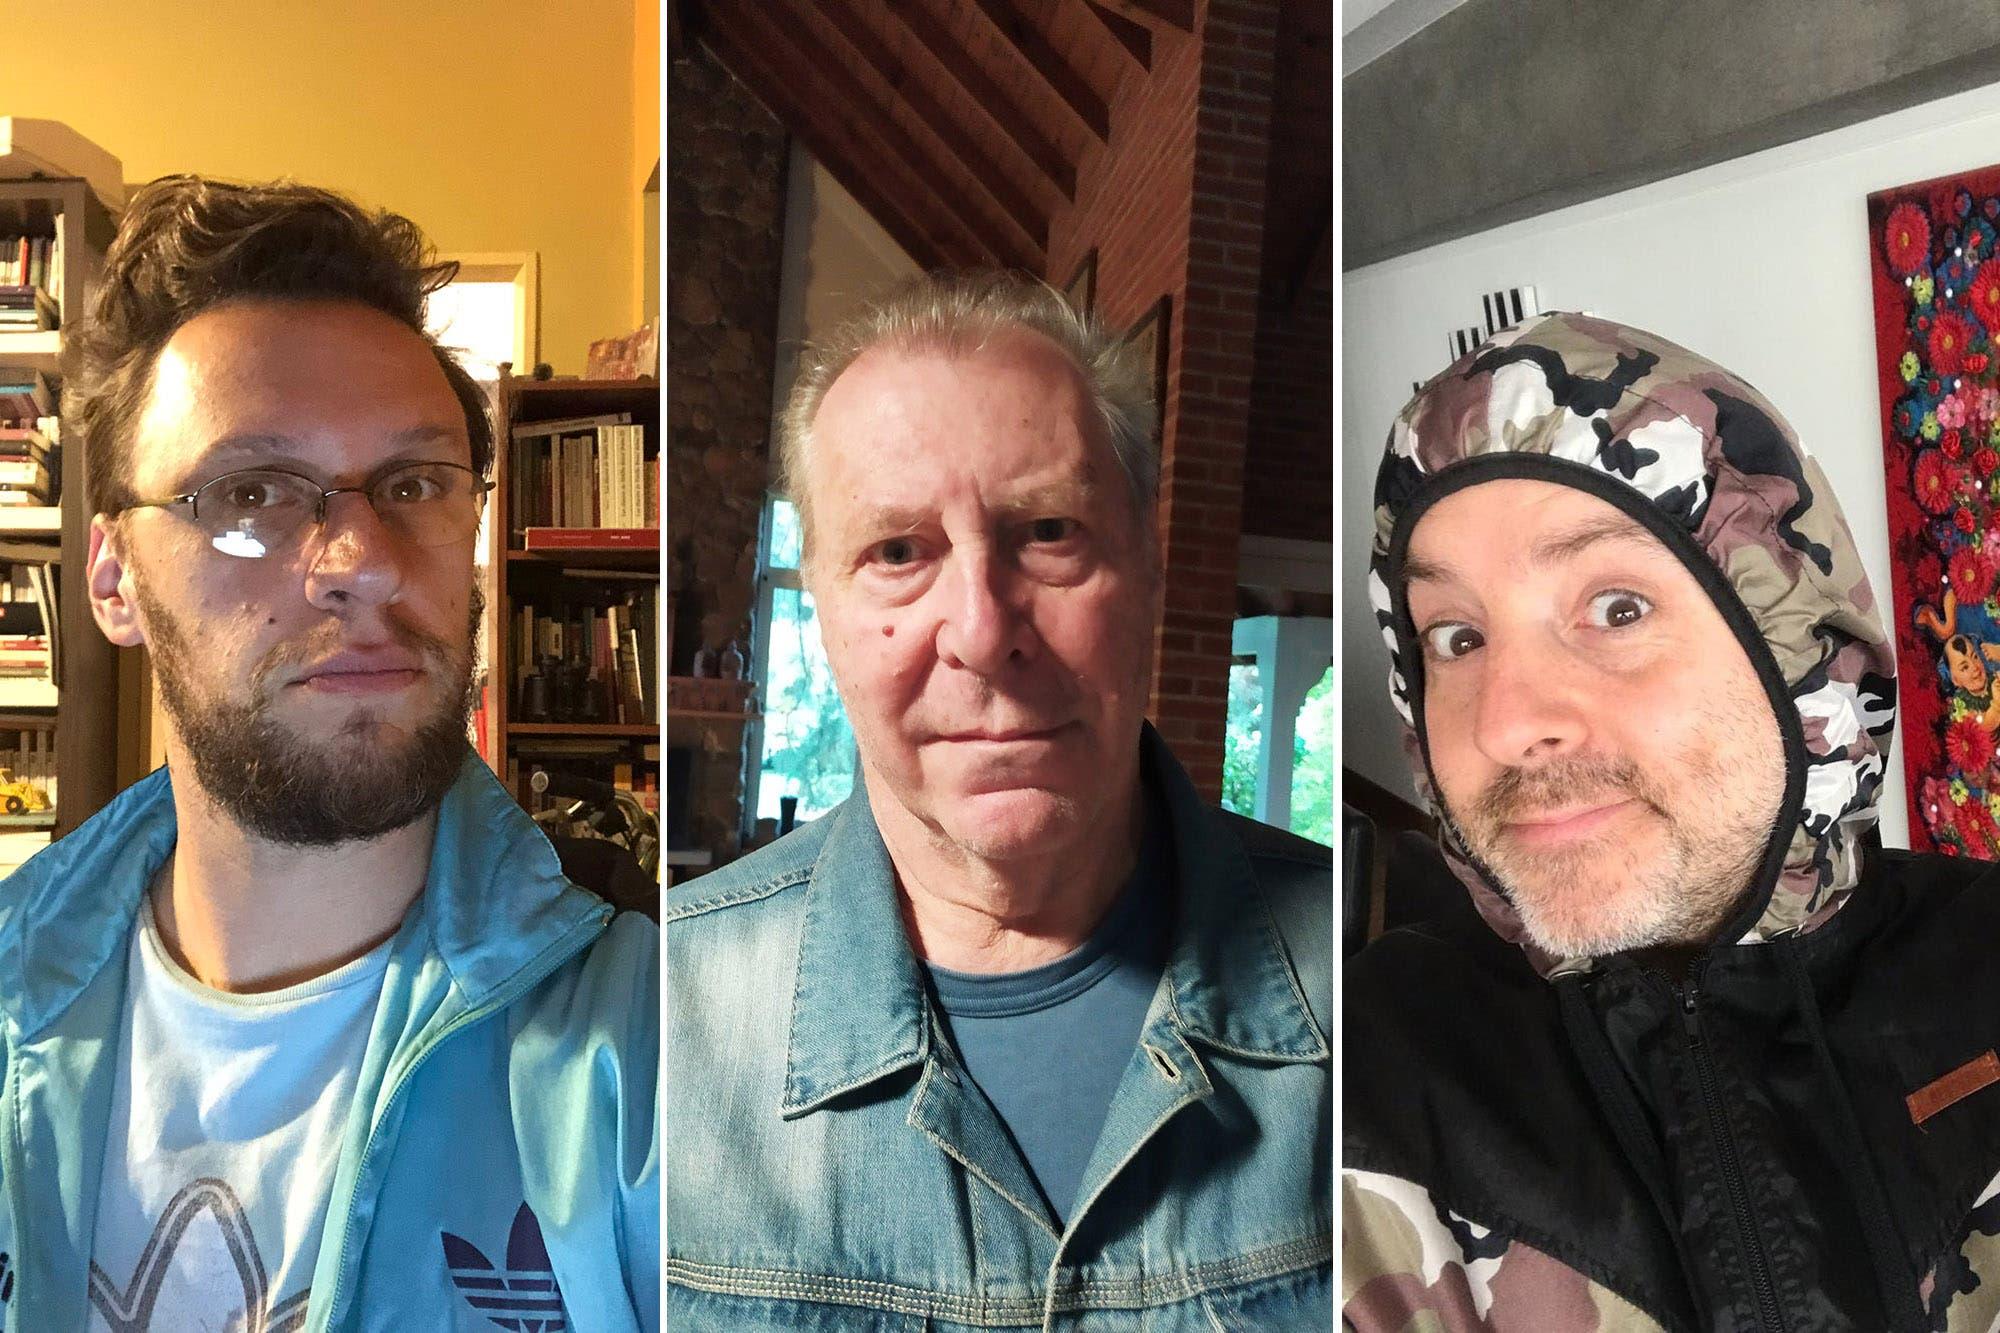 Coronavirus: Kartun, Muscari, Tenconi Blanco y la problemática del teatro en cuarentena